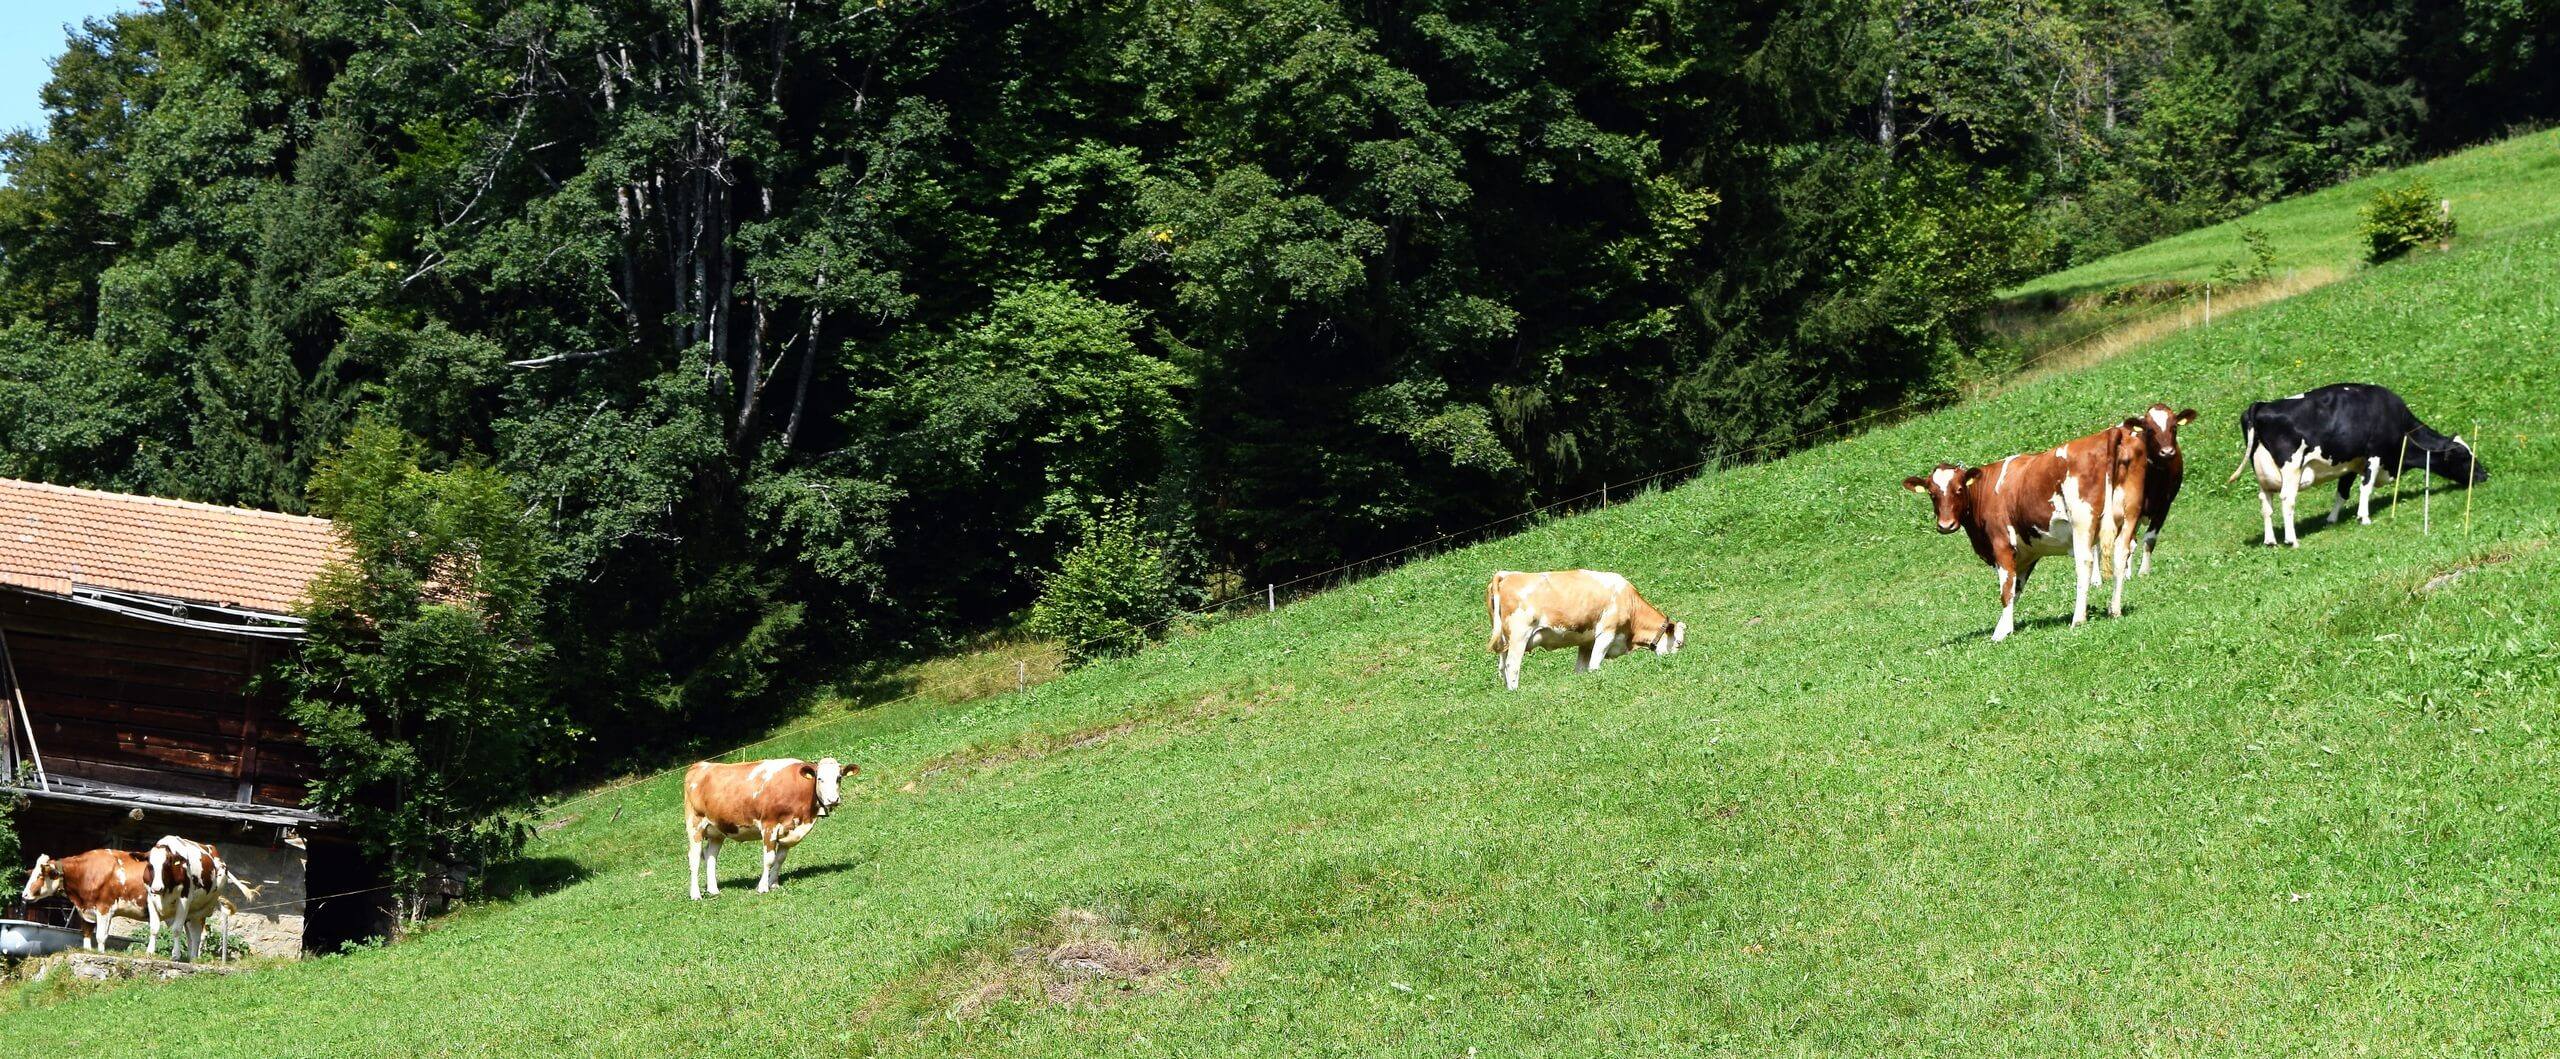 beatenberg-stallvisite-kuhwiese-bauernhof-sommer